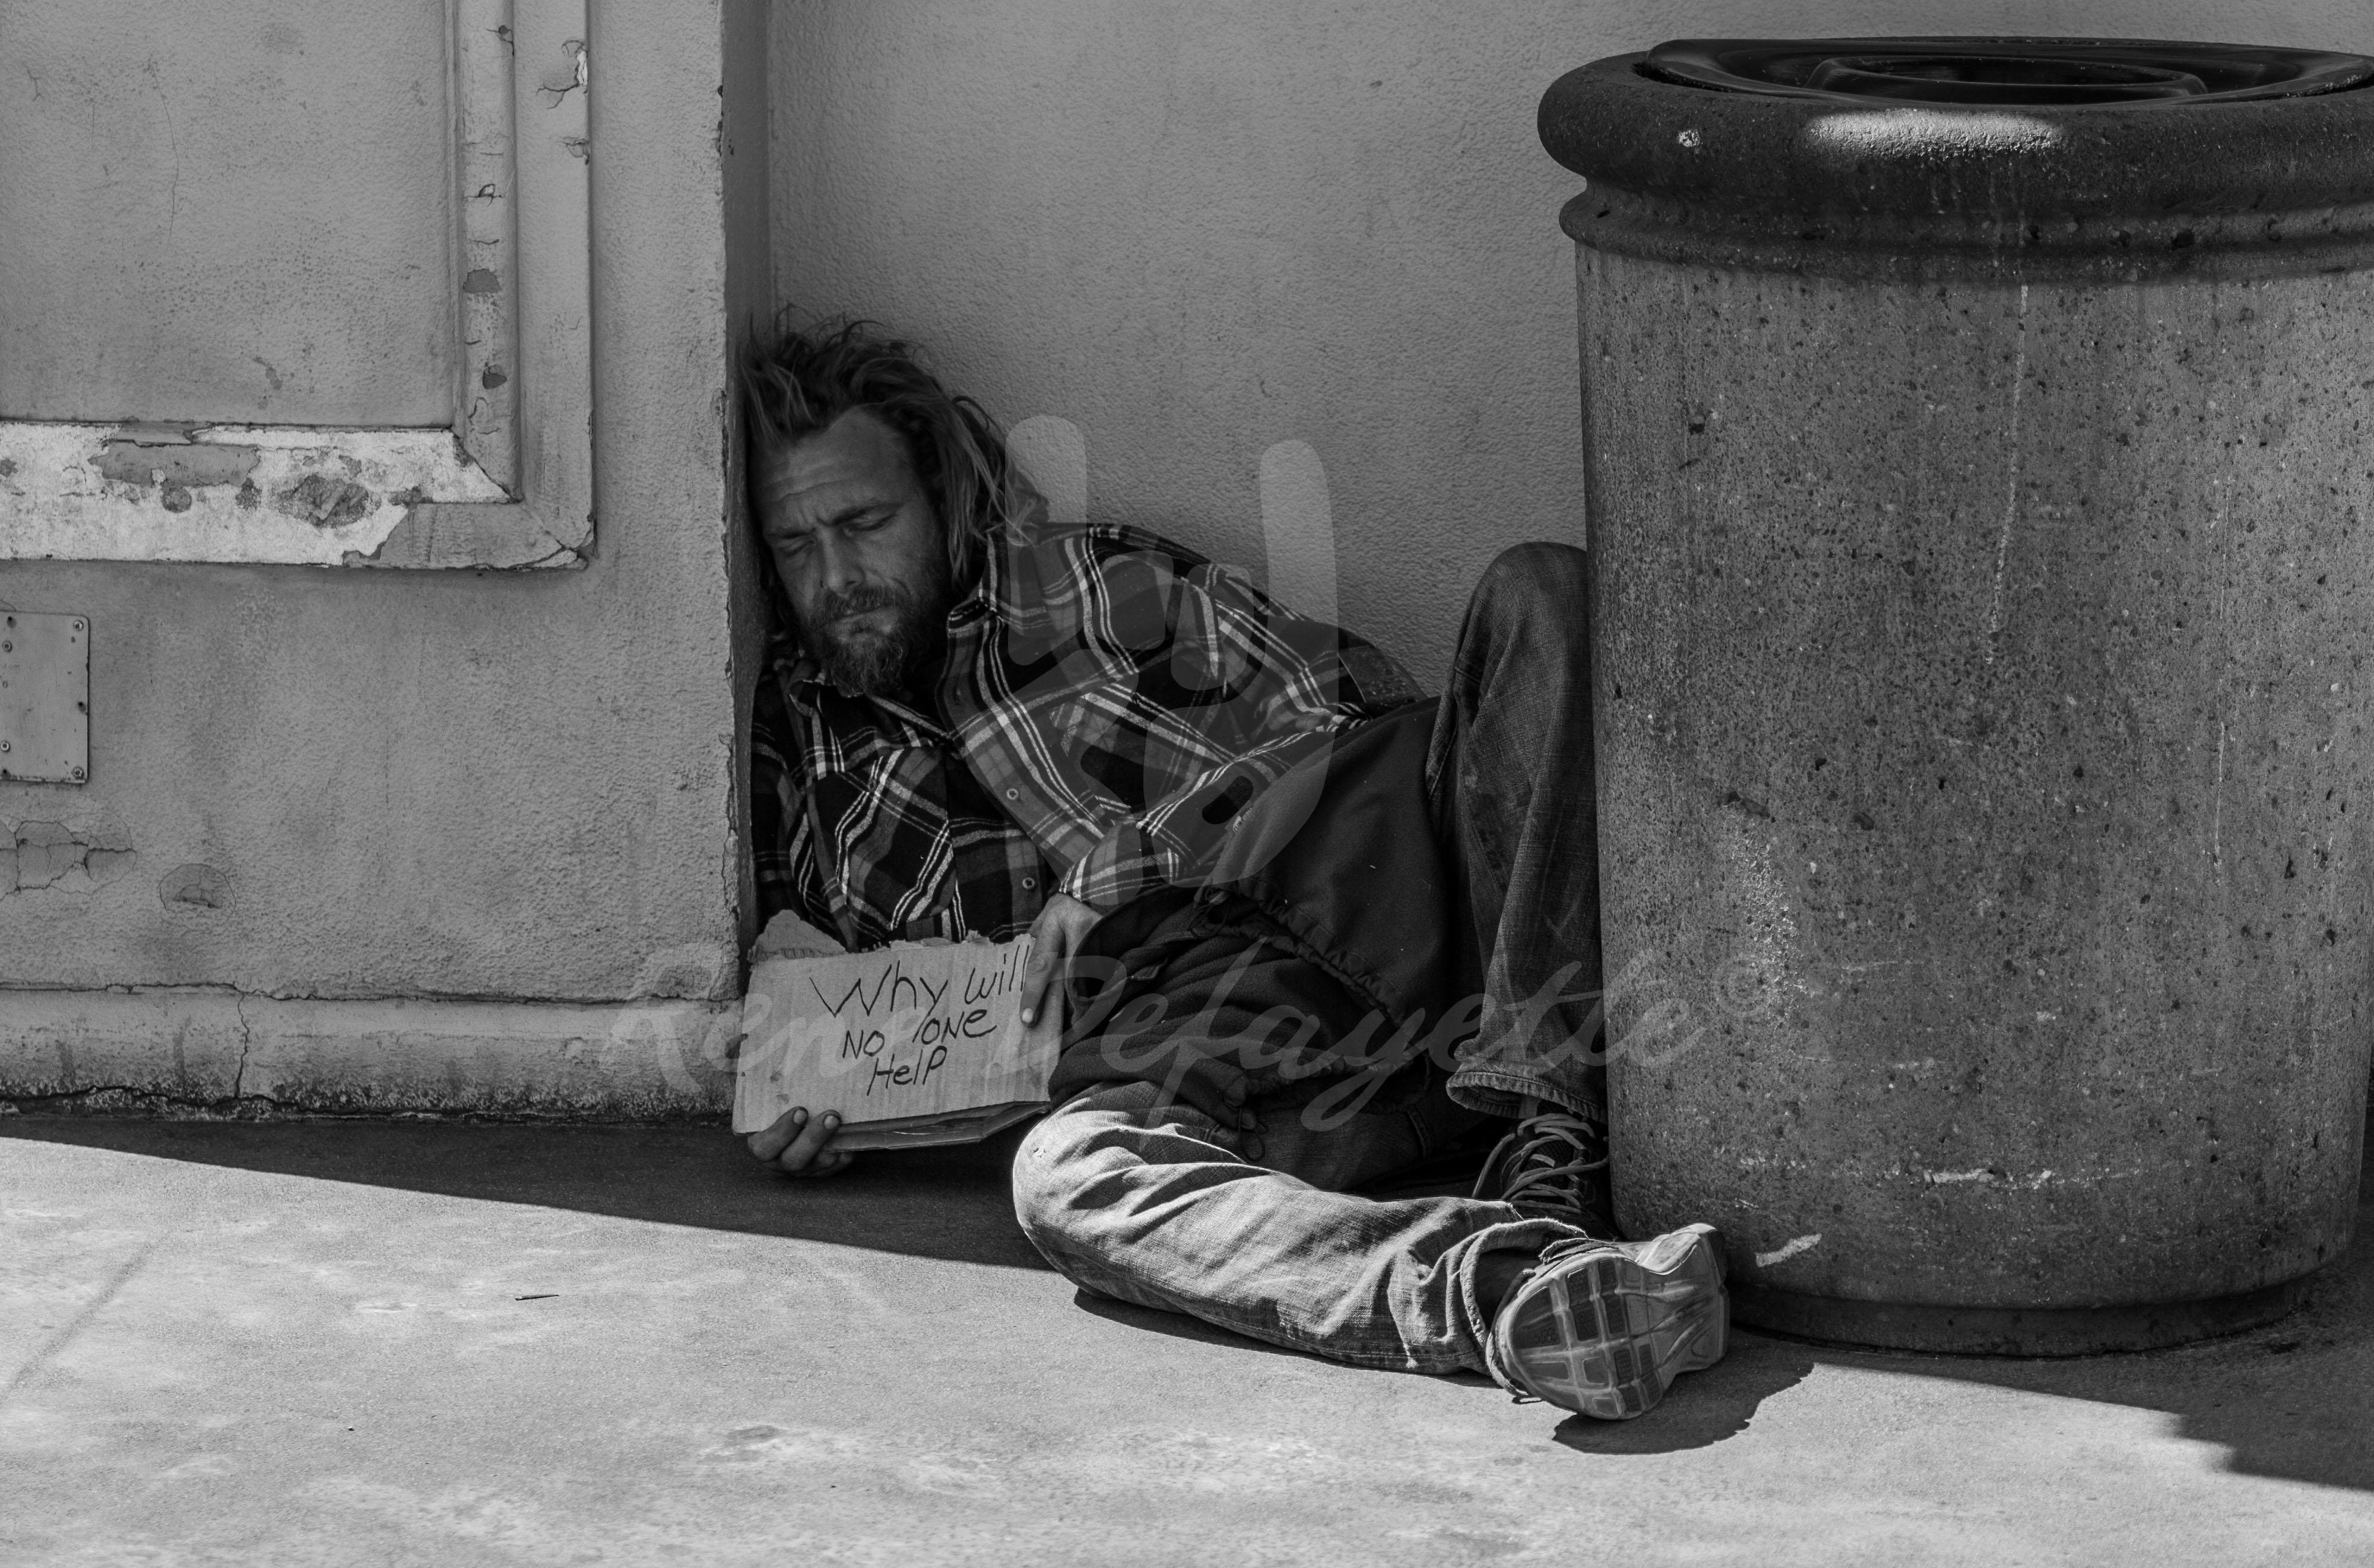 Photo Las Vegas Homeless Streetphotography T1 1040594